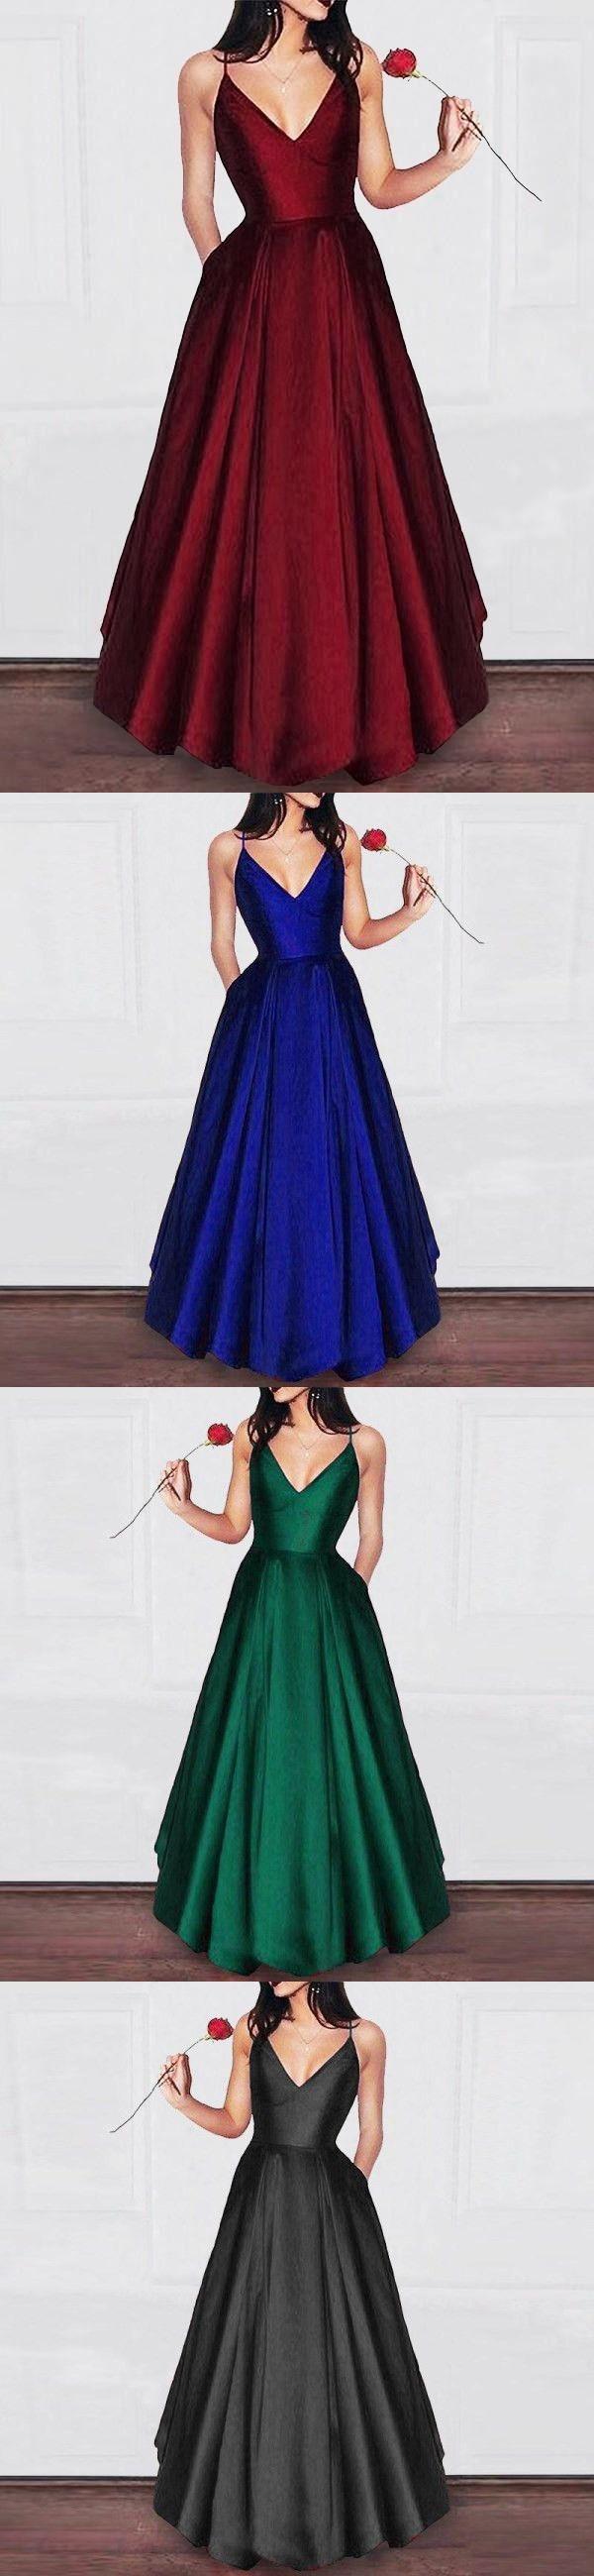 Amazing elegant a line dark red satin prom dress girls graduation